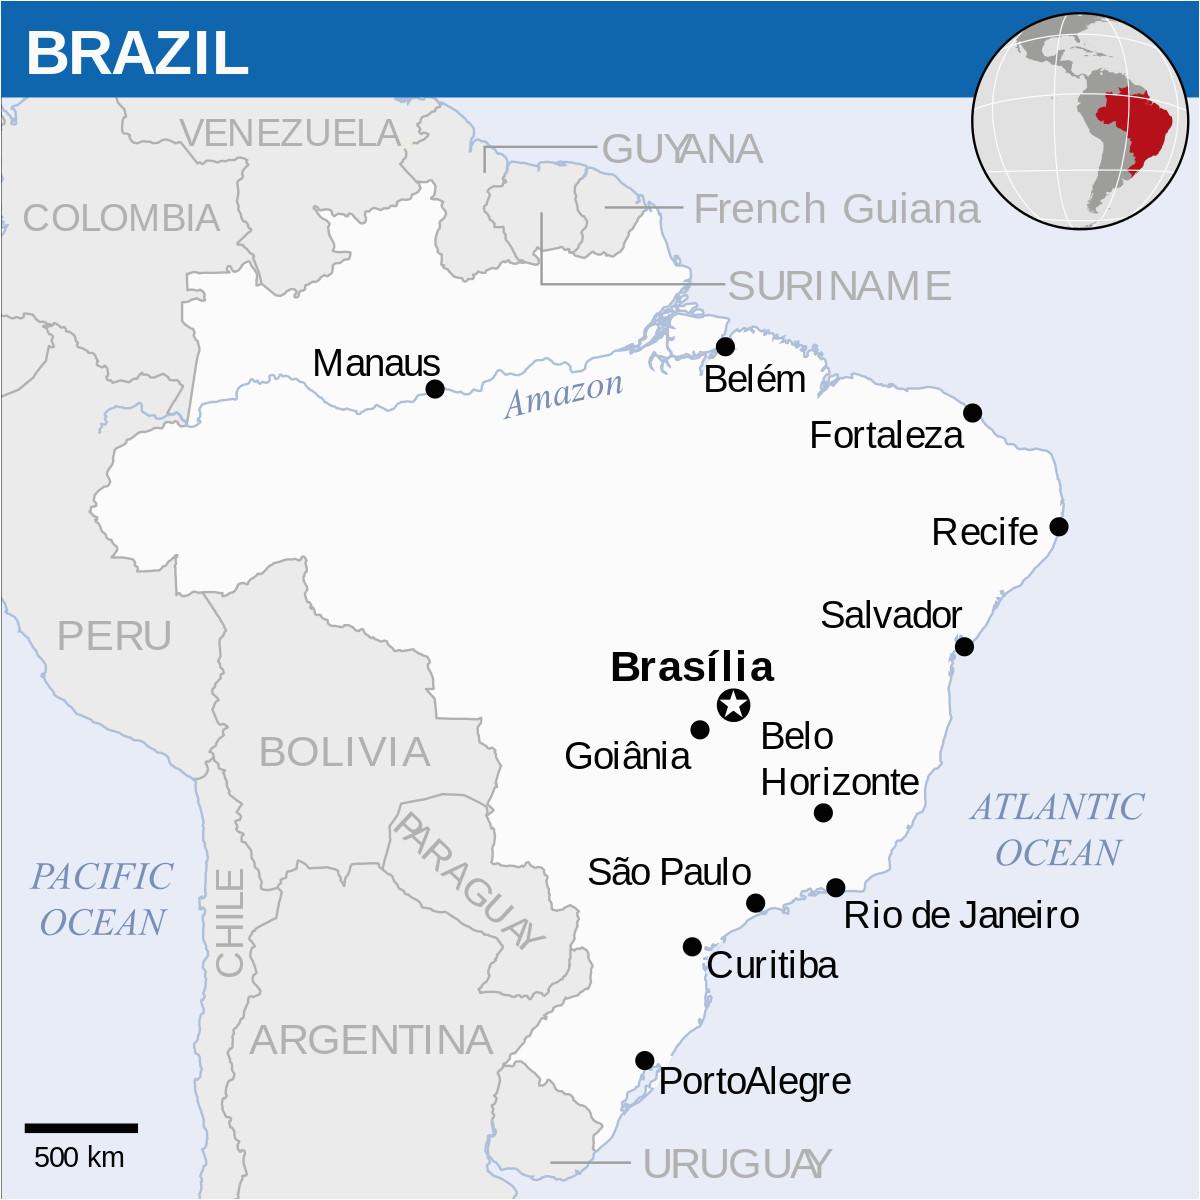 atlas of brazil wikimedia commons